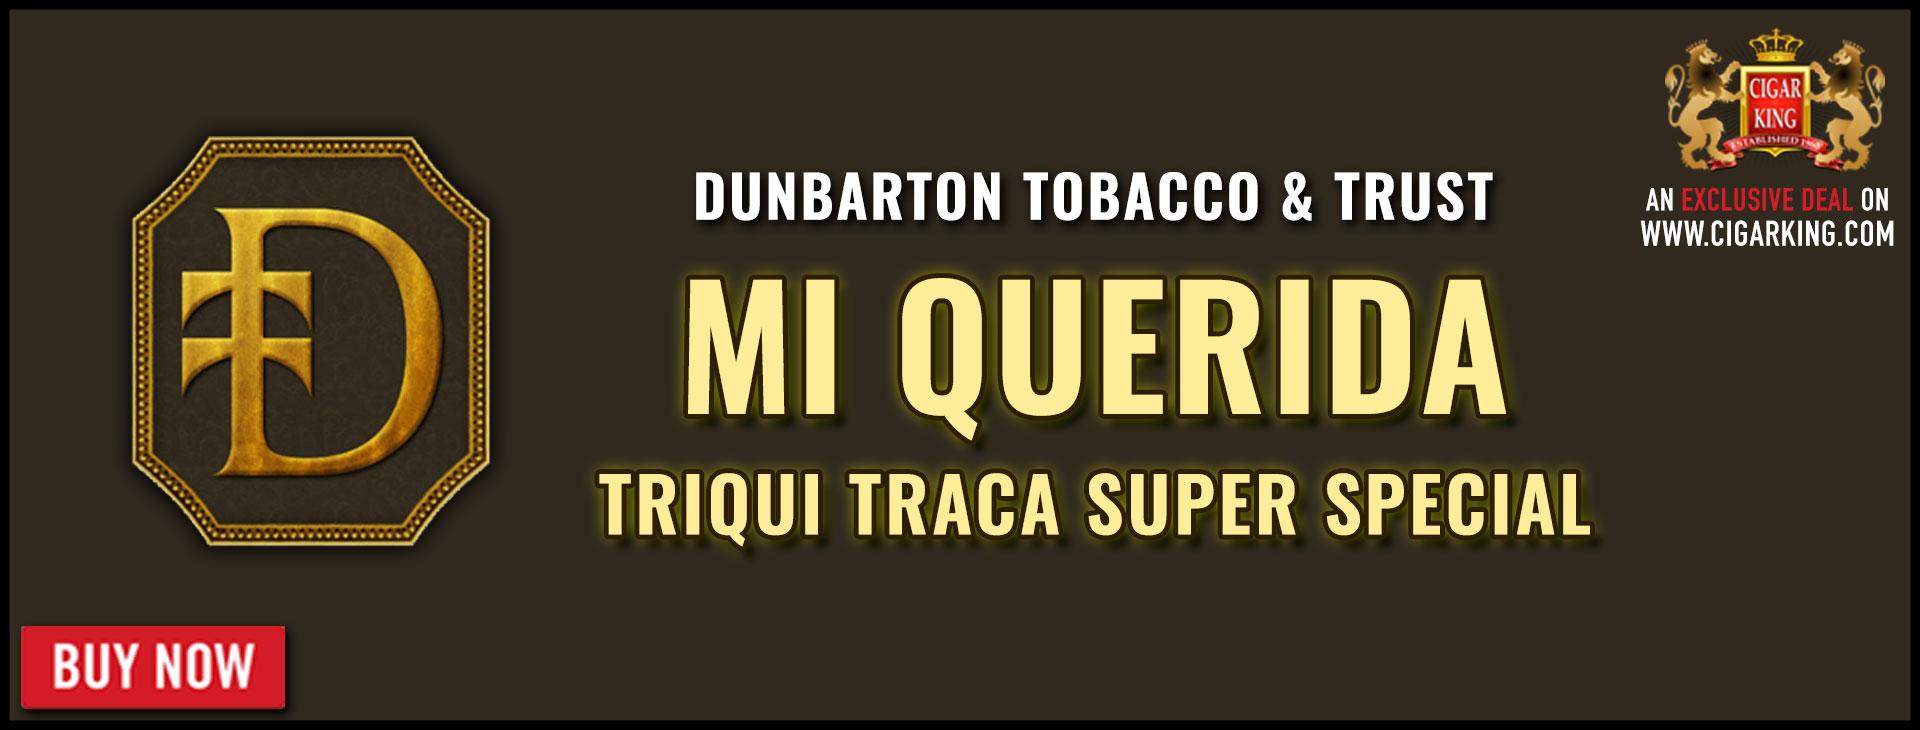 triqui-traca-2020-banner.jpg